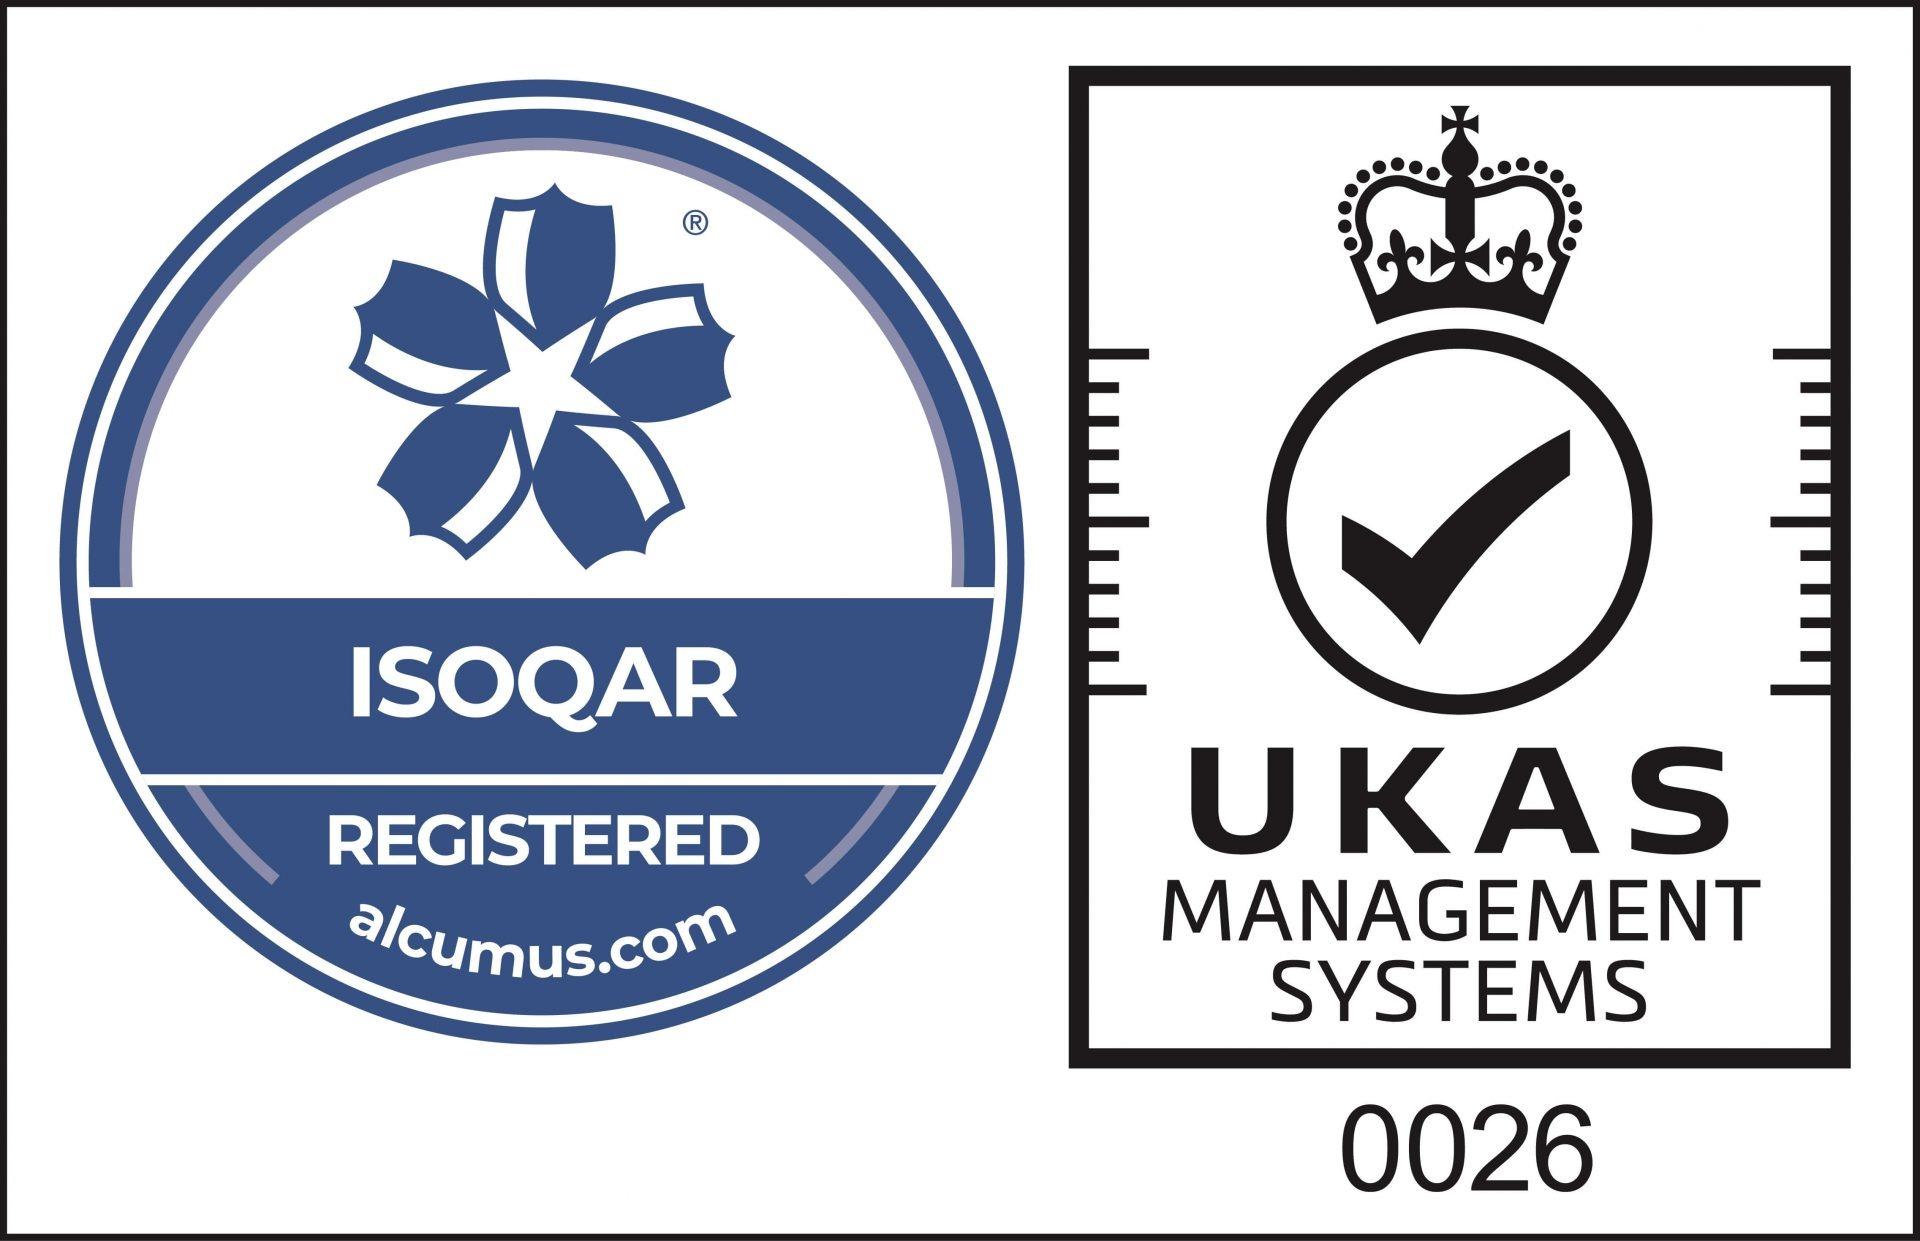 UKAS-ISOQAR